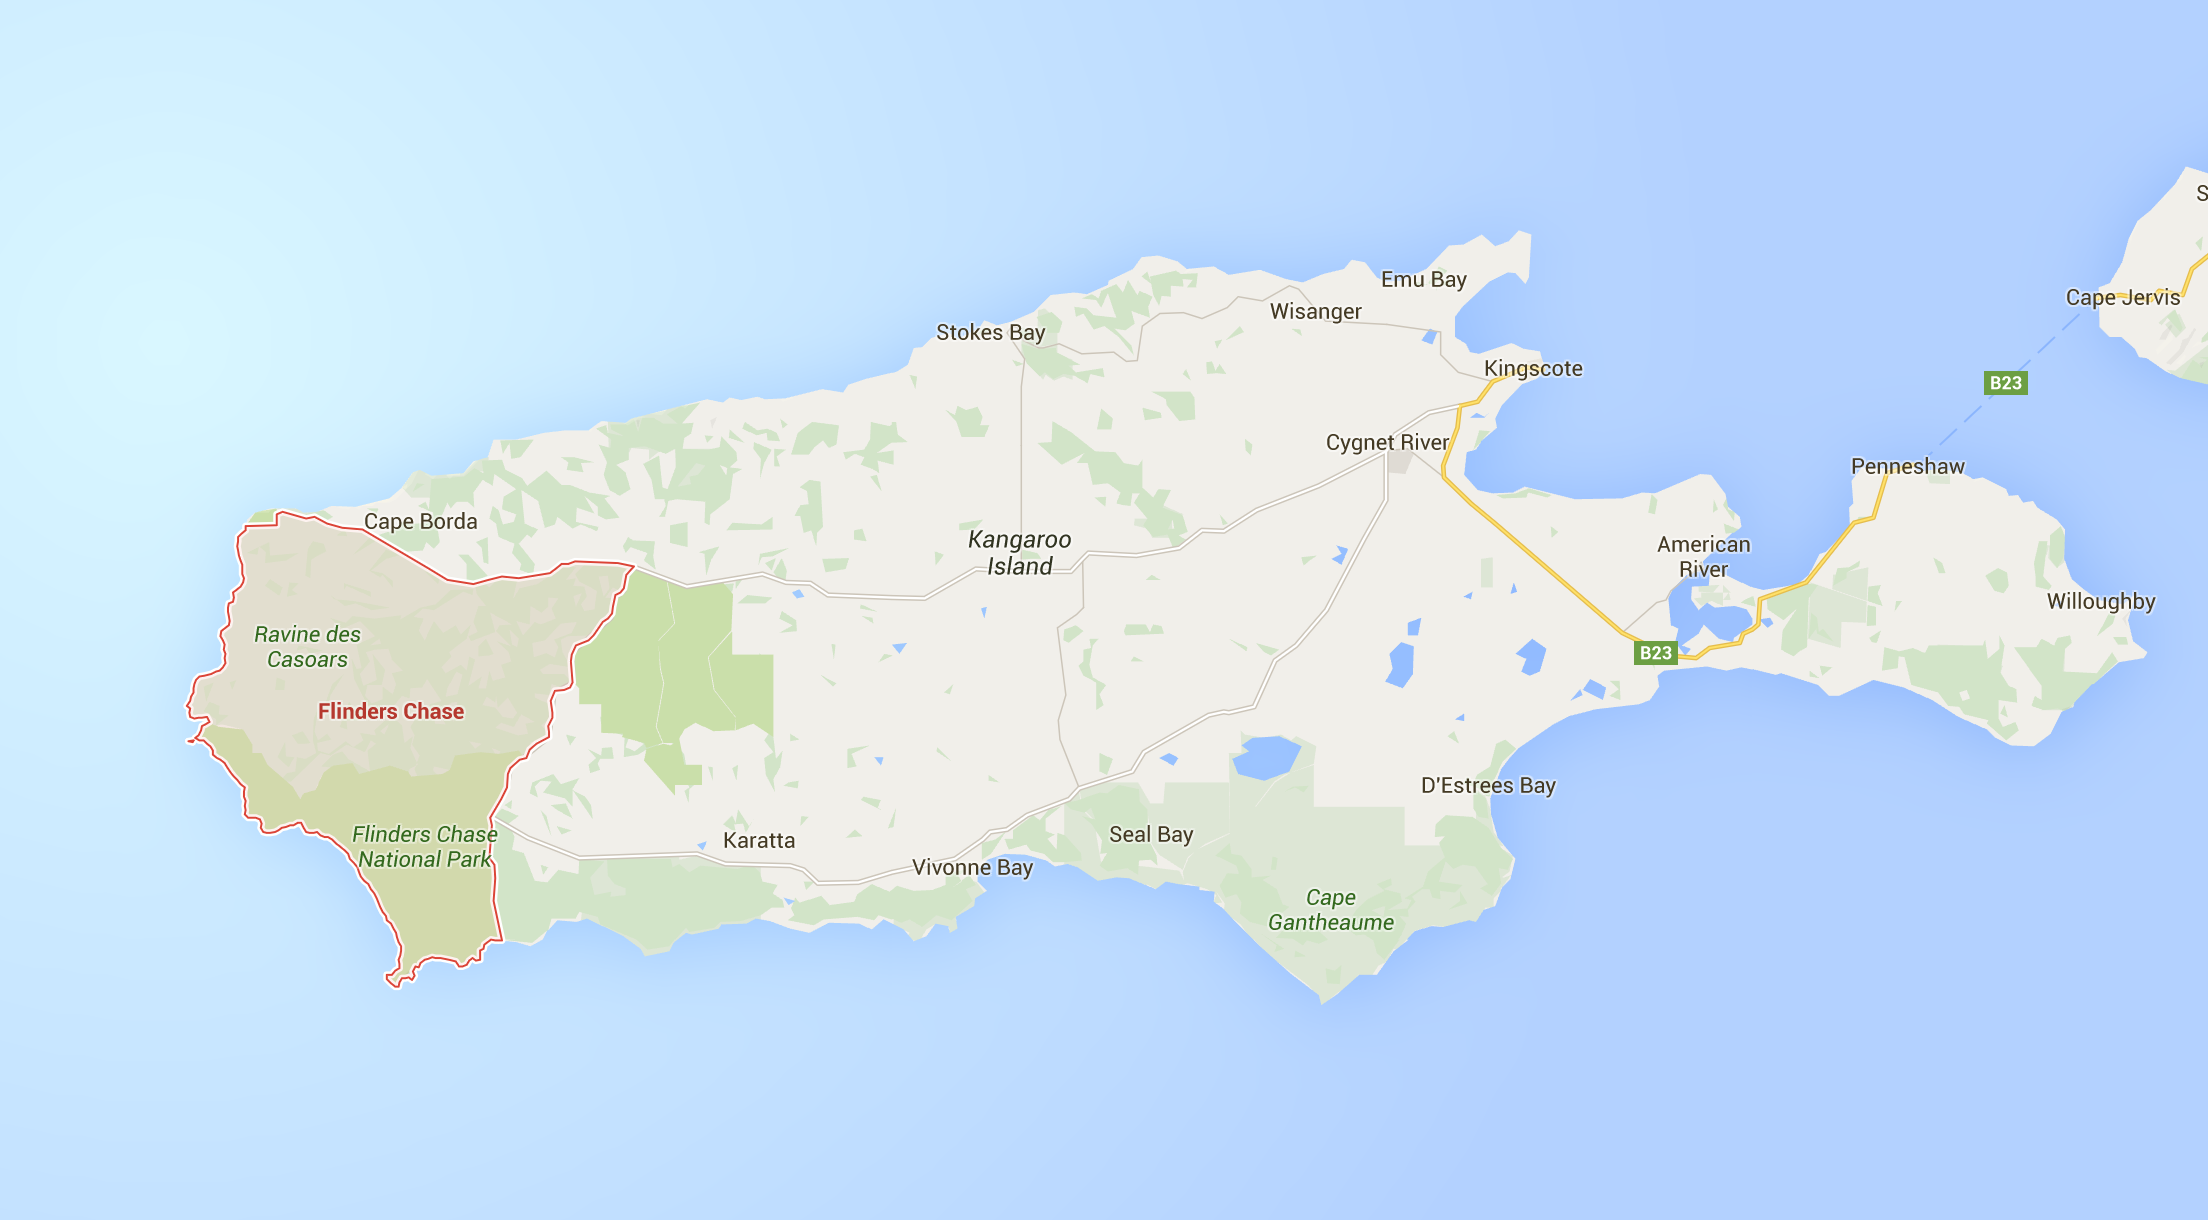 Flinders Chase, Kangaroo Island, Australia